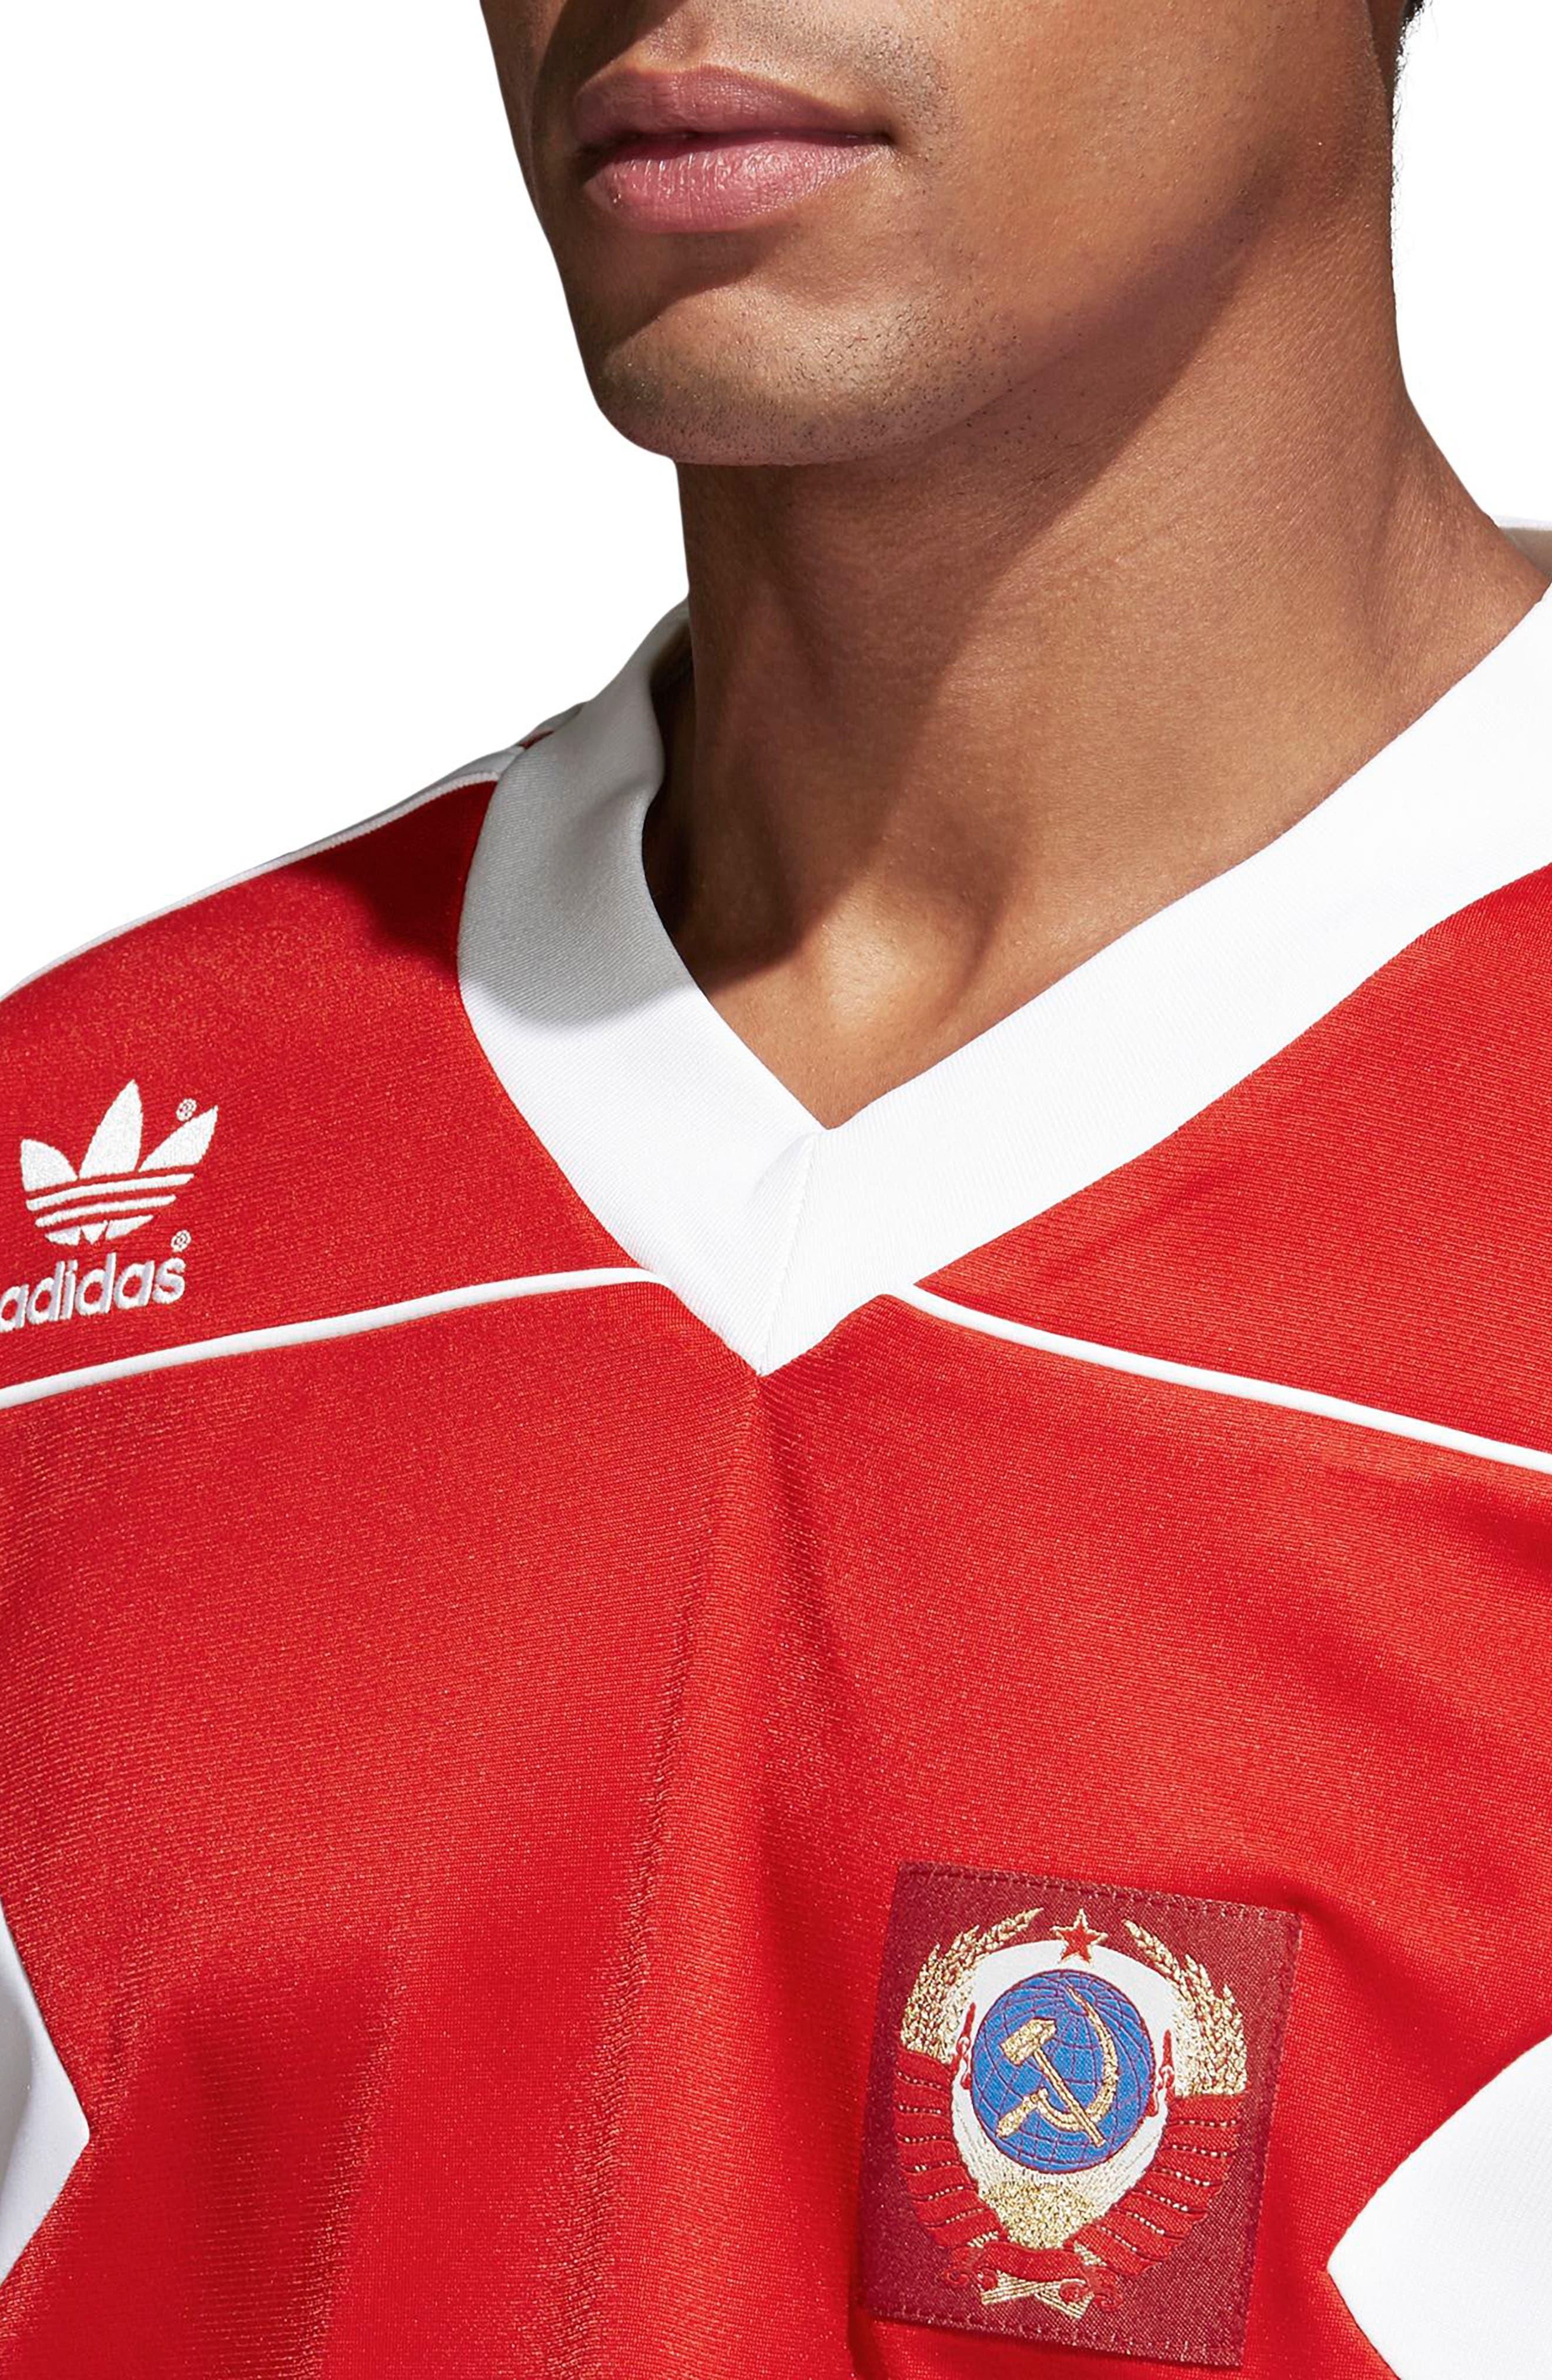 adidas Original Russia 1991 Soccer Jersey,                             Alternate thumbnail 5, color,                             610